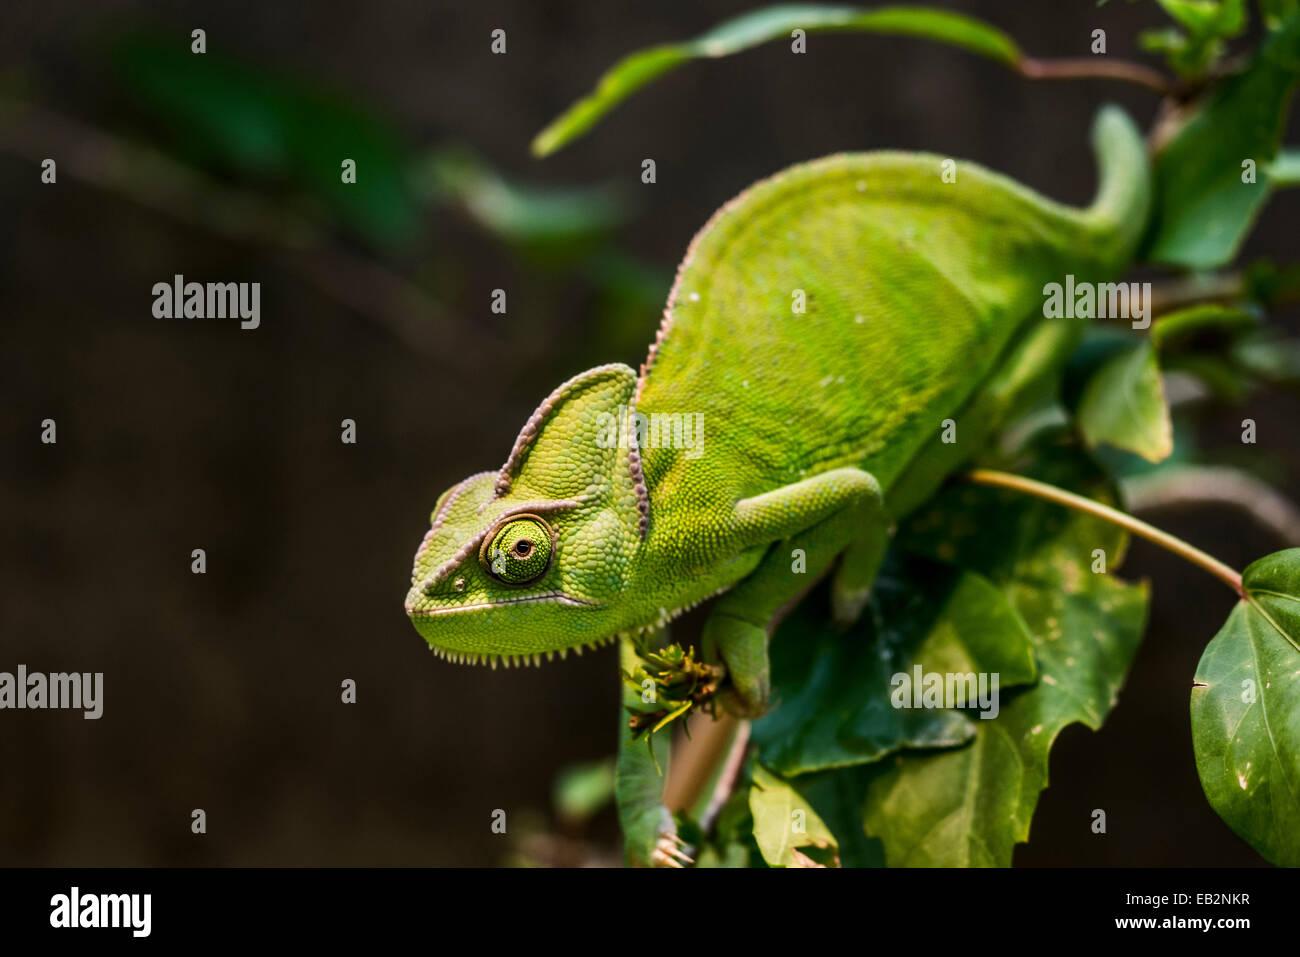 Yemen Chameleon or Veiled Chameleon (Chamaeleo calyptratus), Wilhelma Zoo and Botanical Garden, Stuttgart, Baden - Stock Image